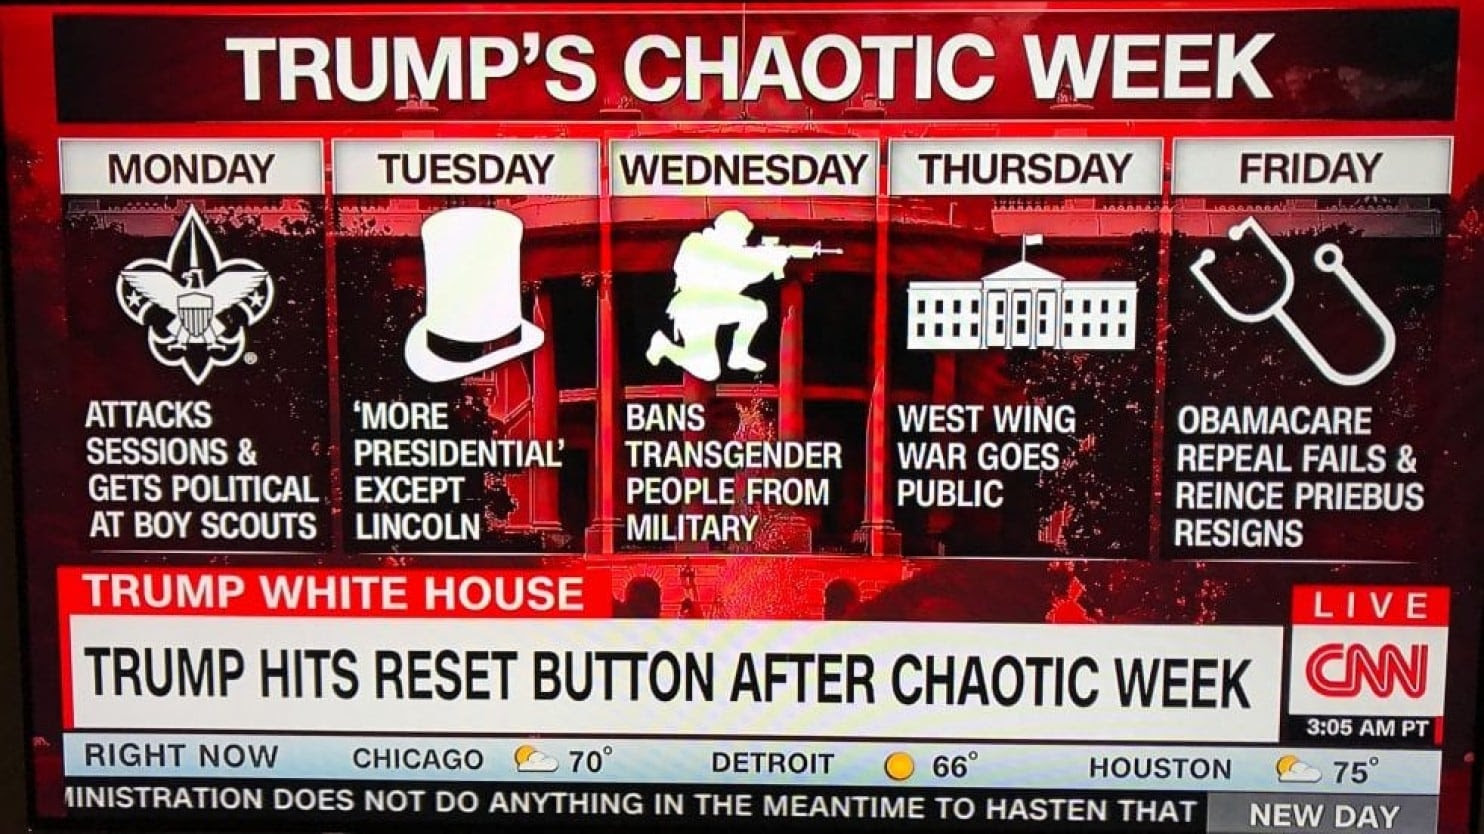 (Credit: CNN via Jonathan Capehart)